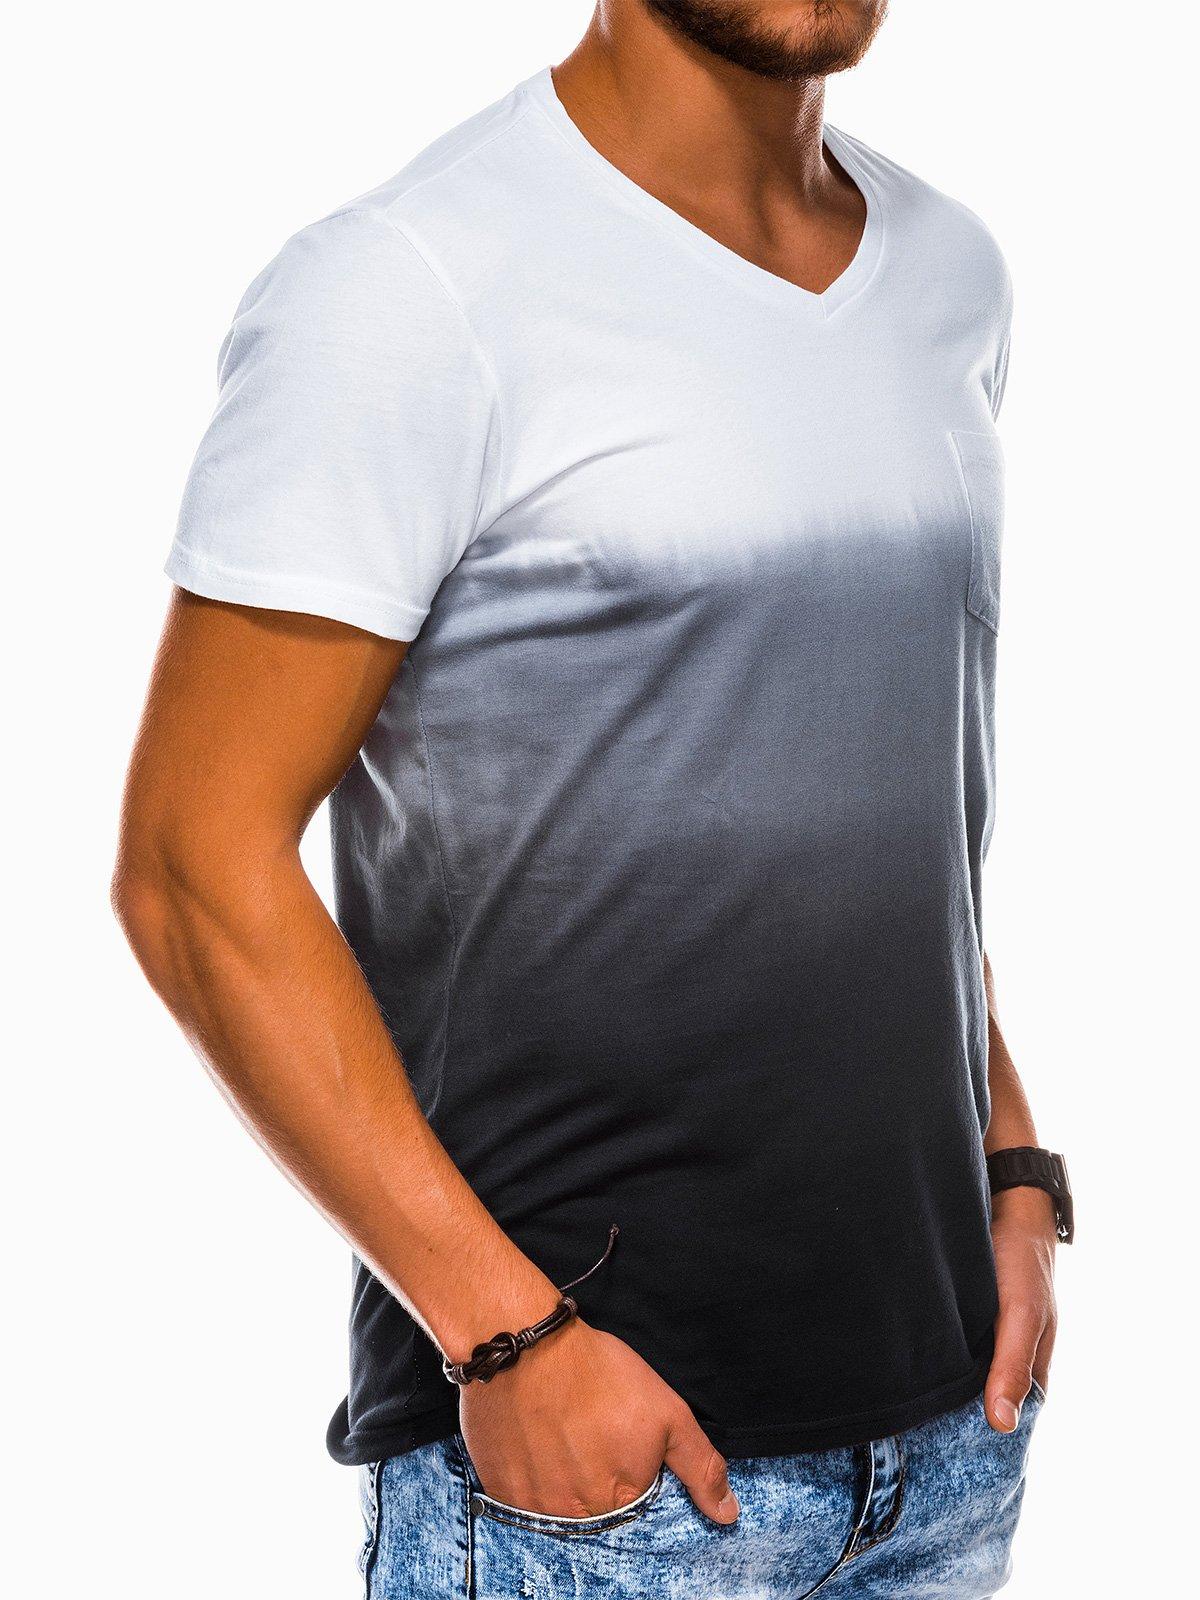 T shirt męski bez nadruku S1100 czarny Sklep Ombre.pl